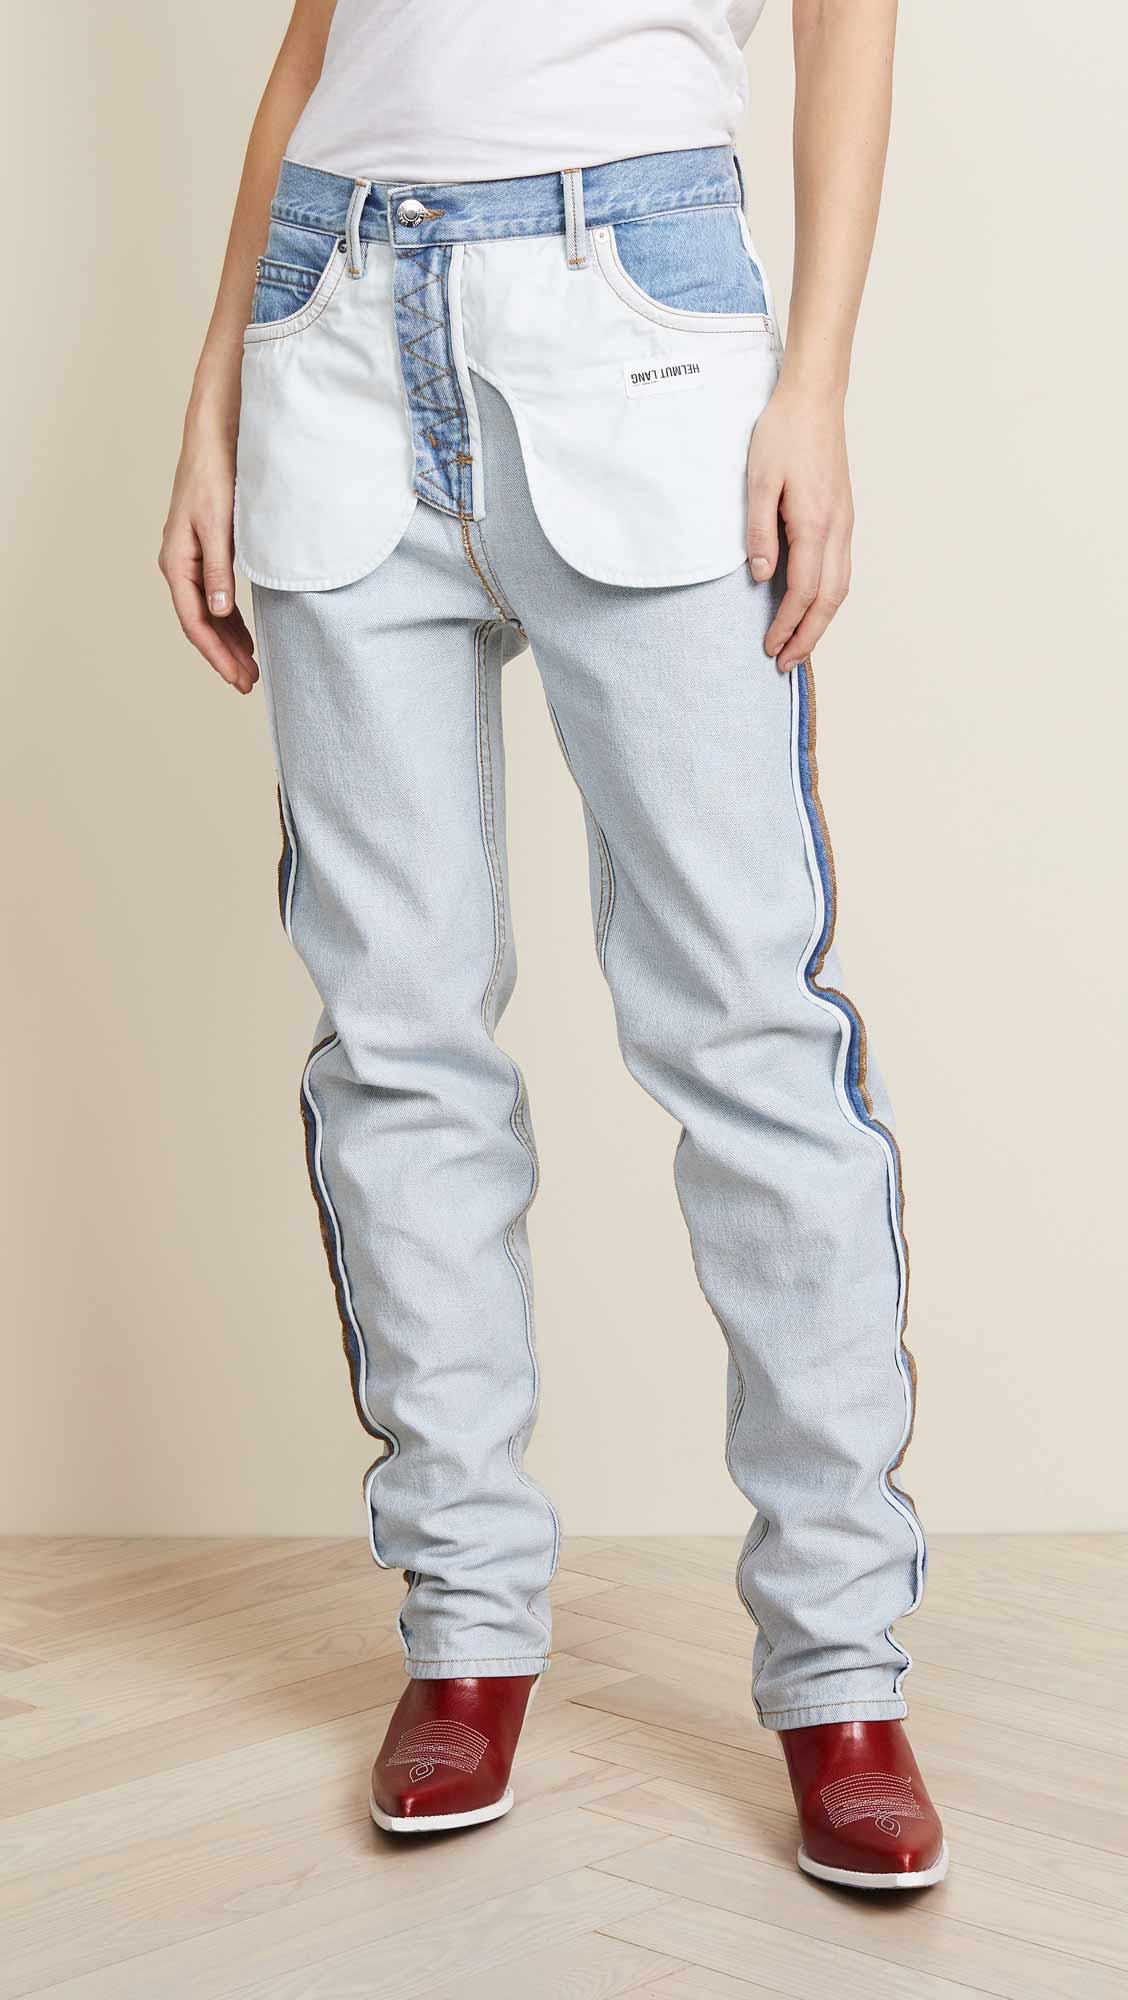 Best Denim Jeans For Women